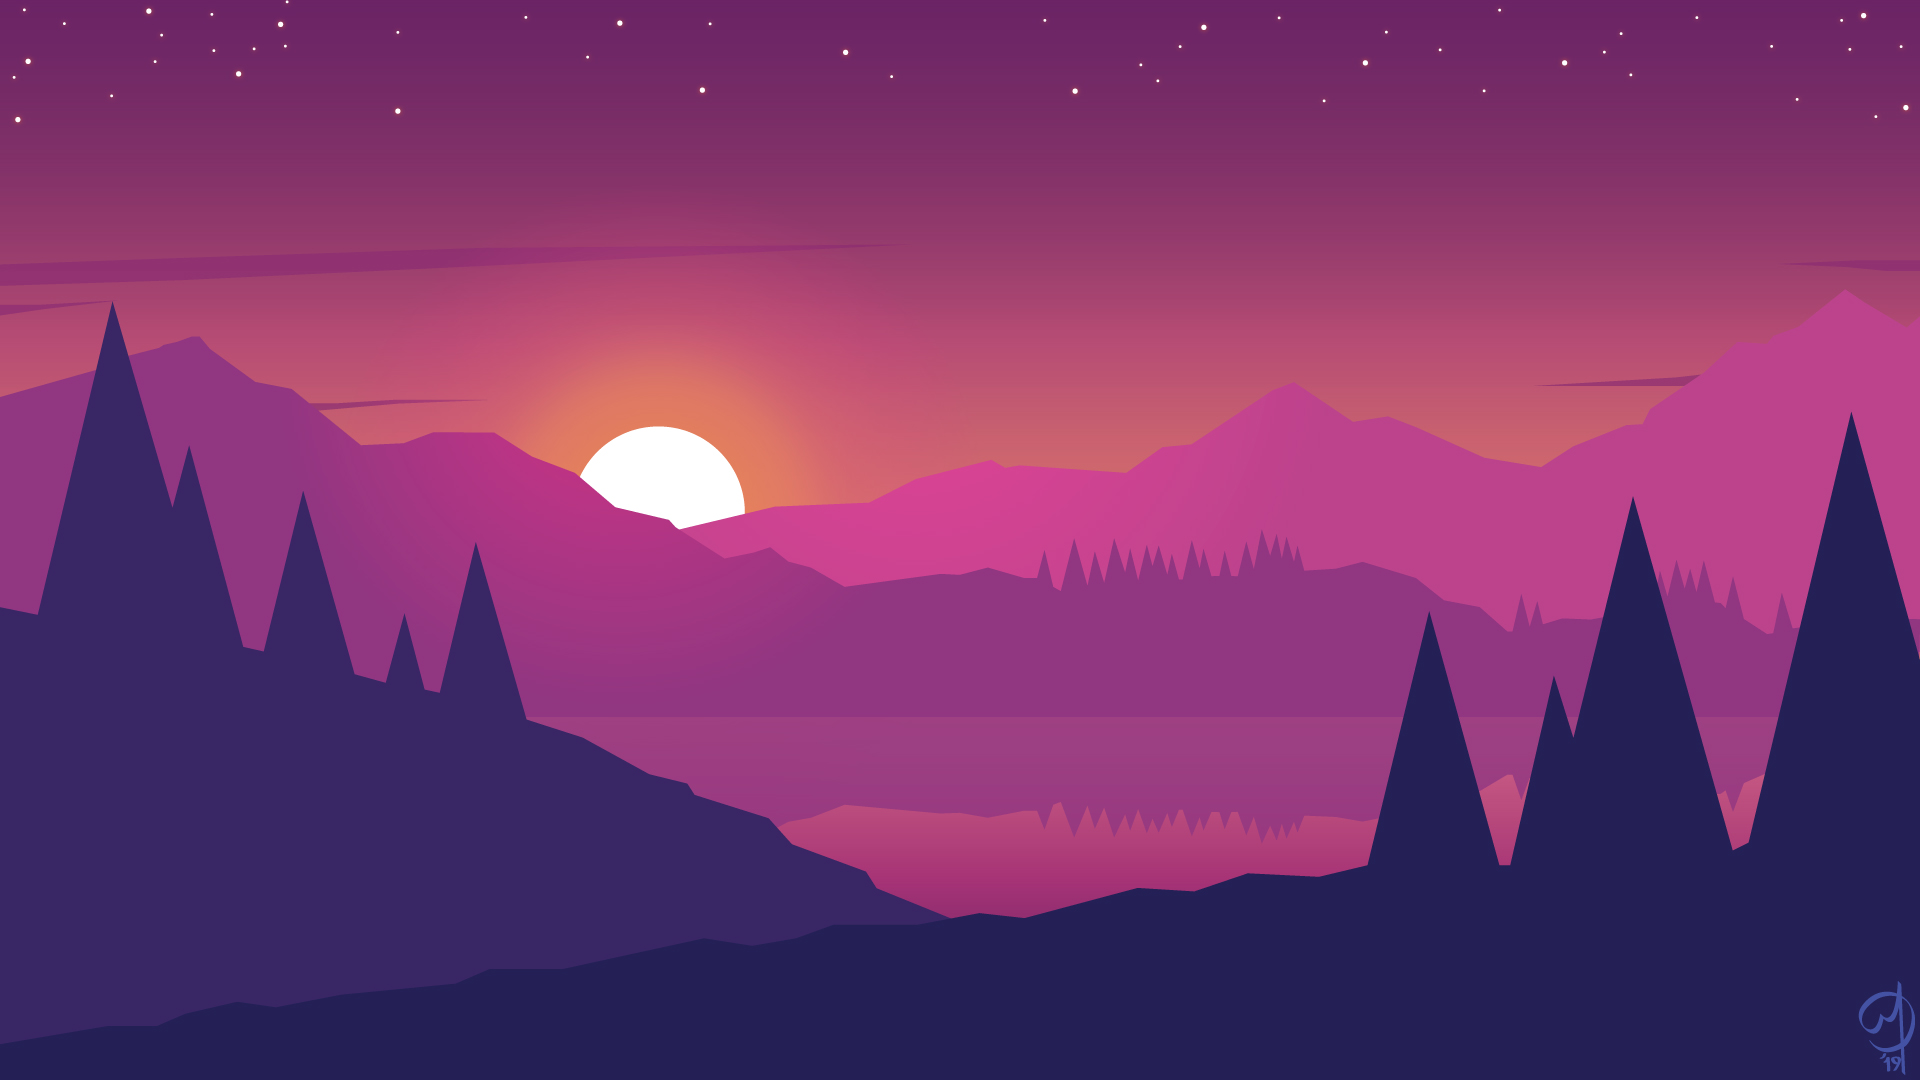 1920x1080 Minimalist Mountains Landscape Scenery Laptop Full